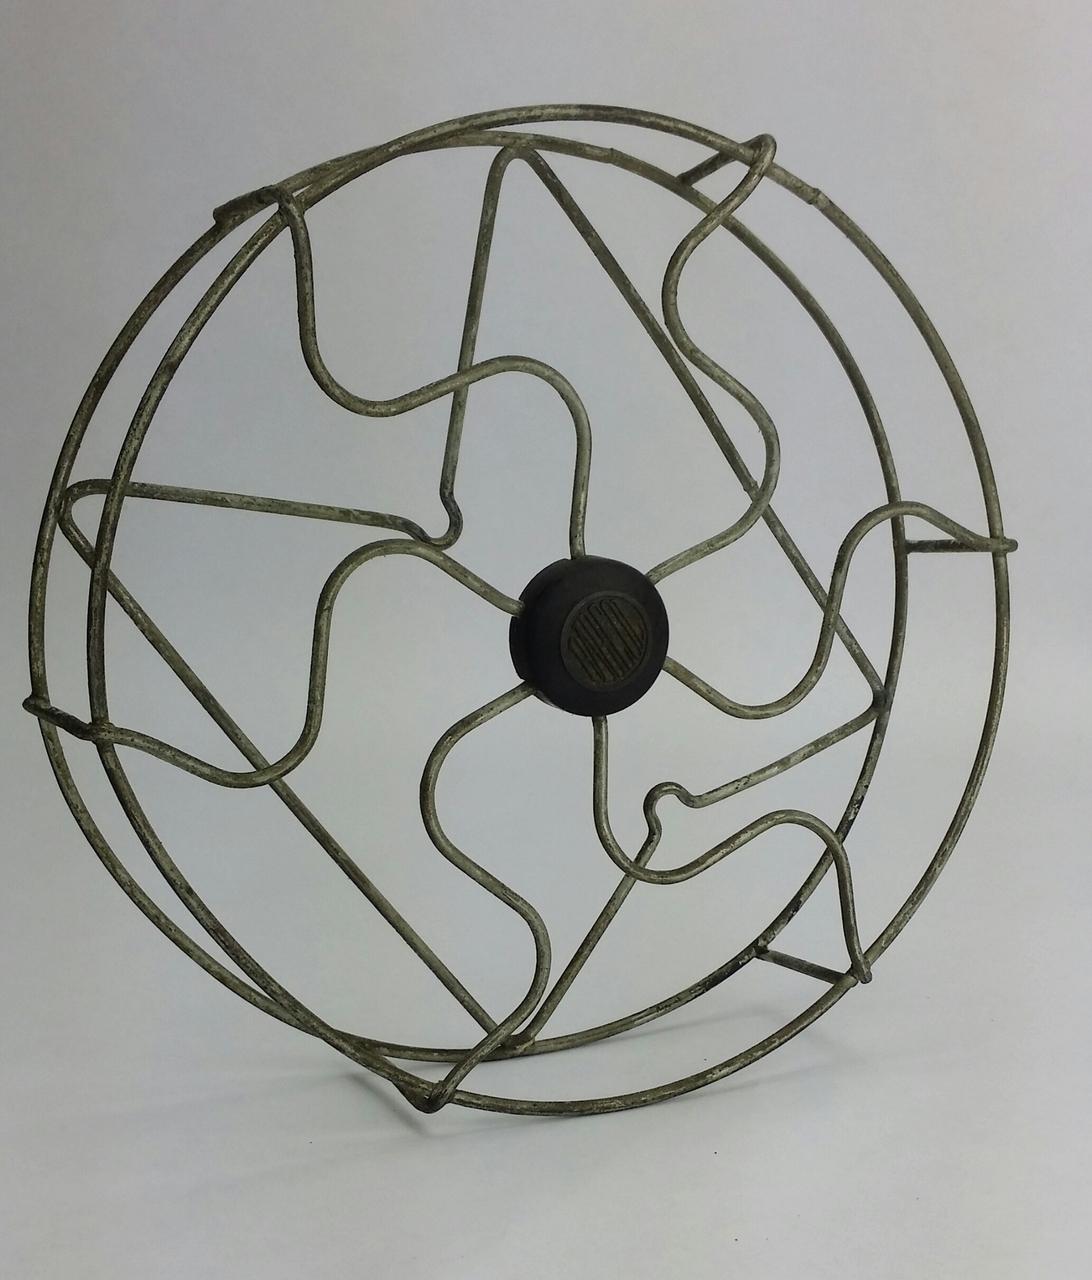 Original Barcol Bakelite Fan Cage/Guard